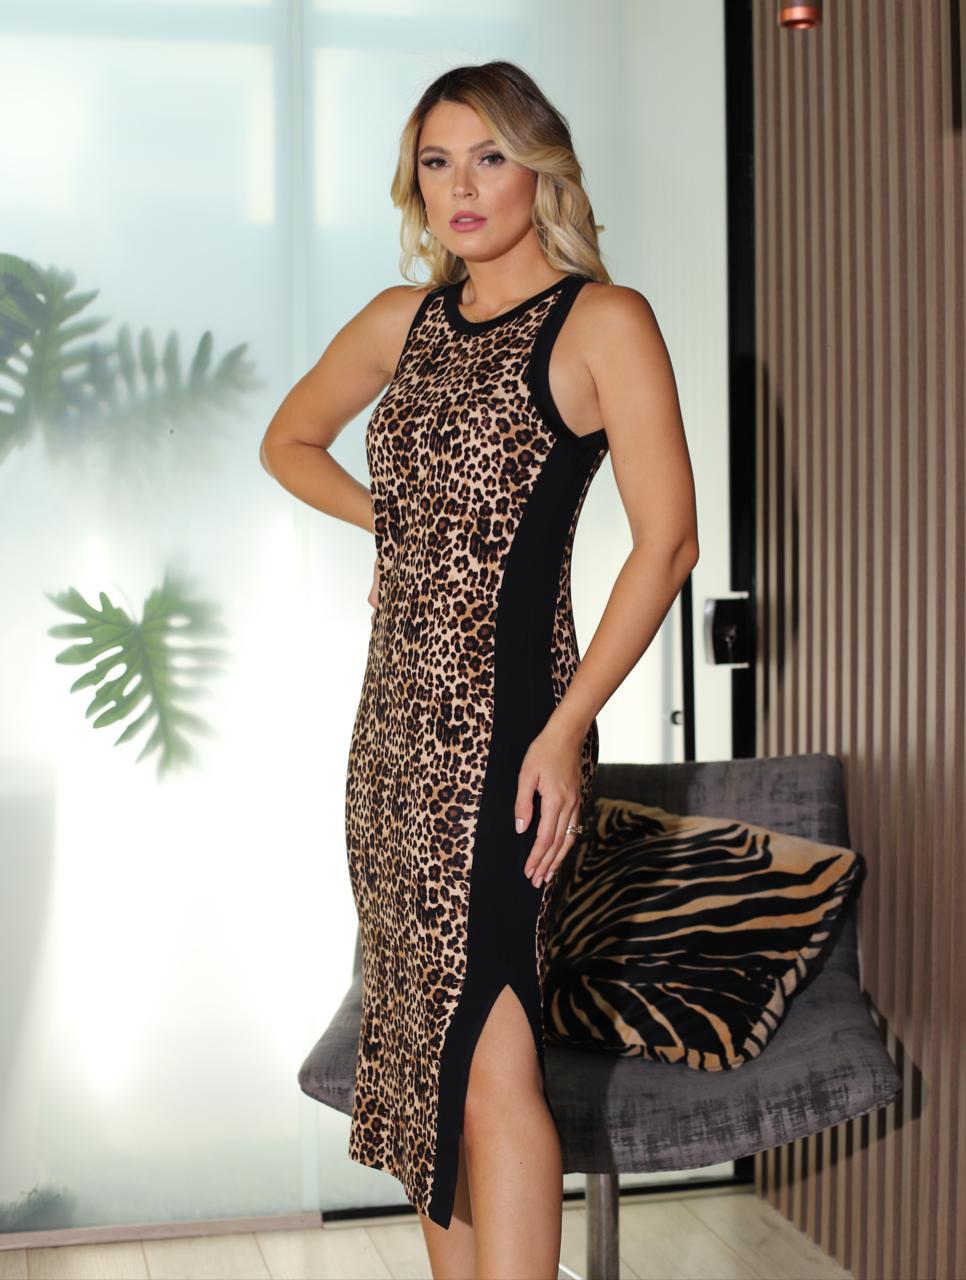 Vestido Jo Midi Moletinho 4% Elastano Animal Print Detalhe Faixas Preta Lateral Fenda +Mascara e Xuxinha P/Cabelo